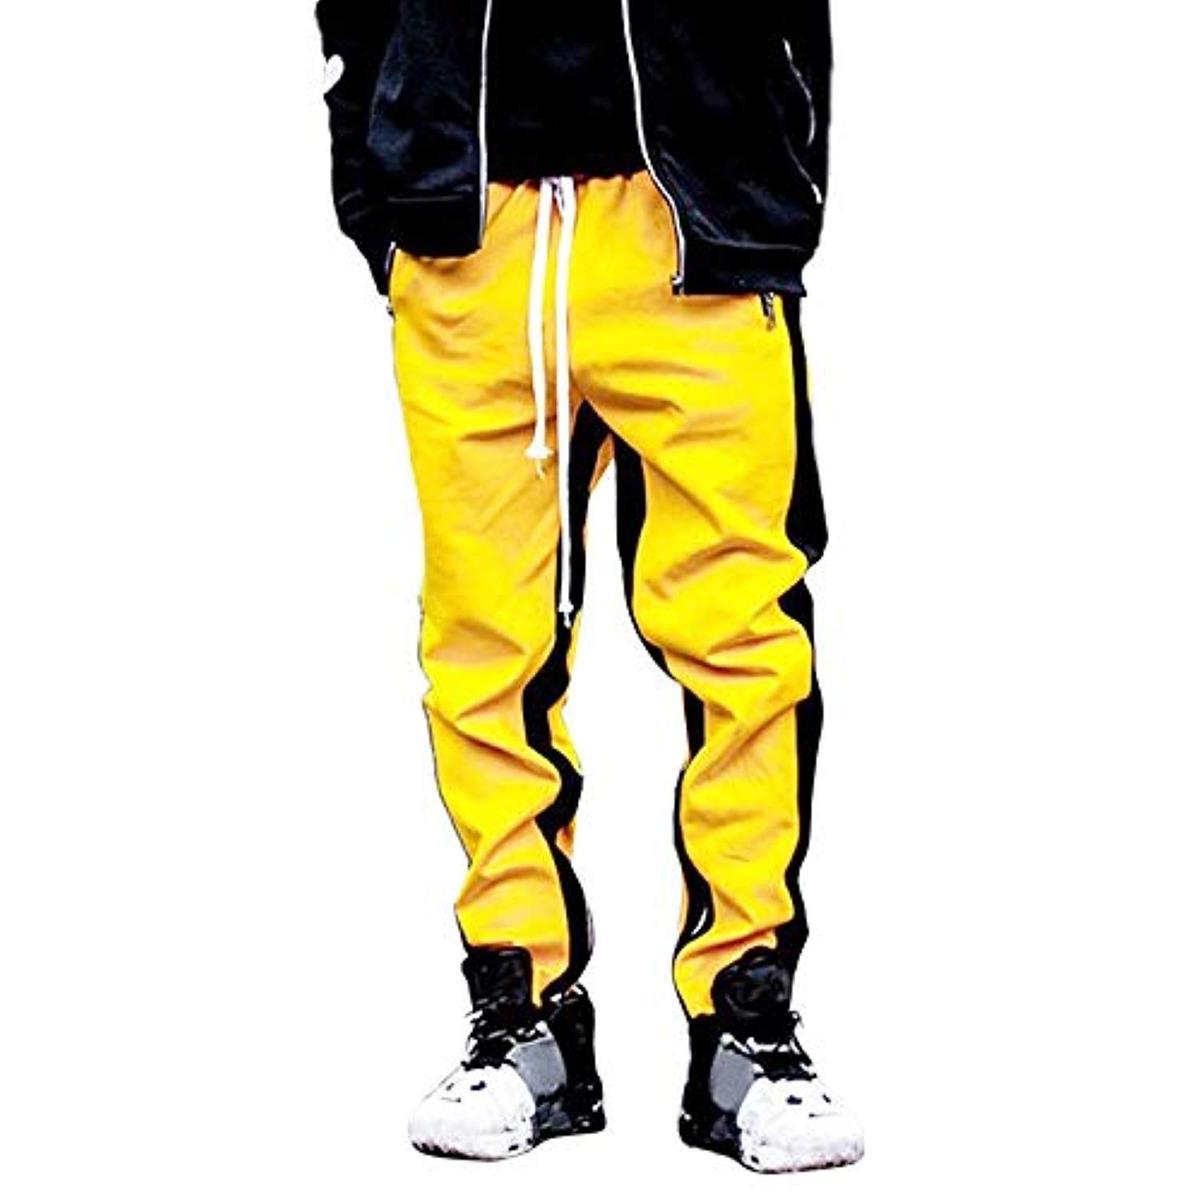 a2c2216e8f Pantalon Hombre Amsky¿ Men Trouser, Fashion